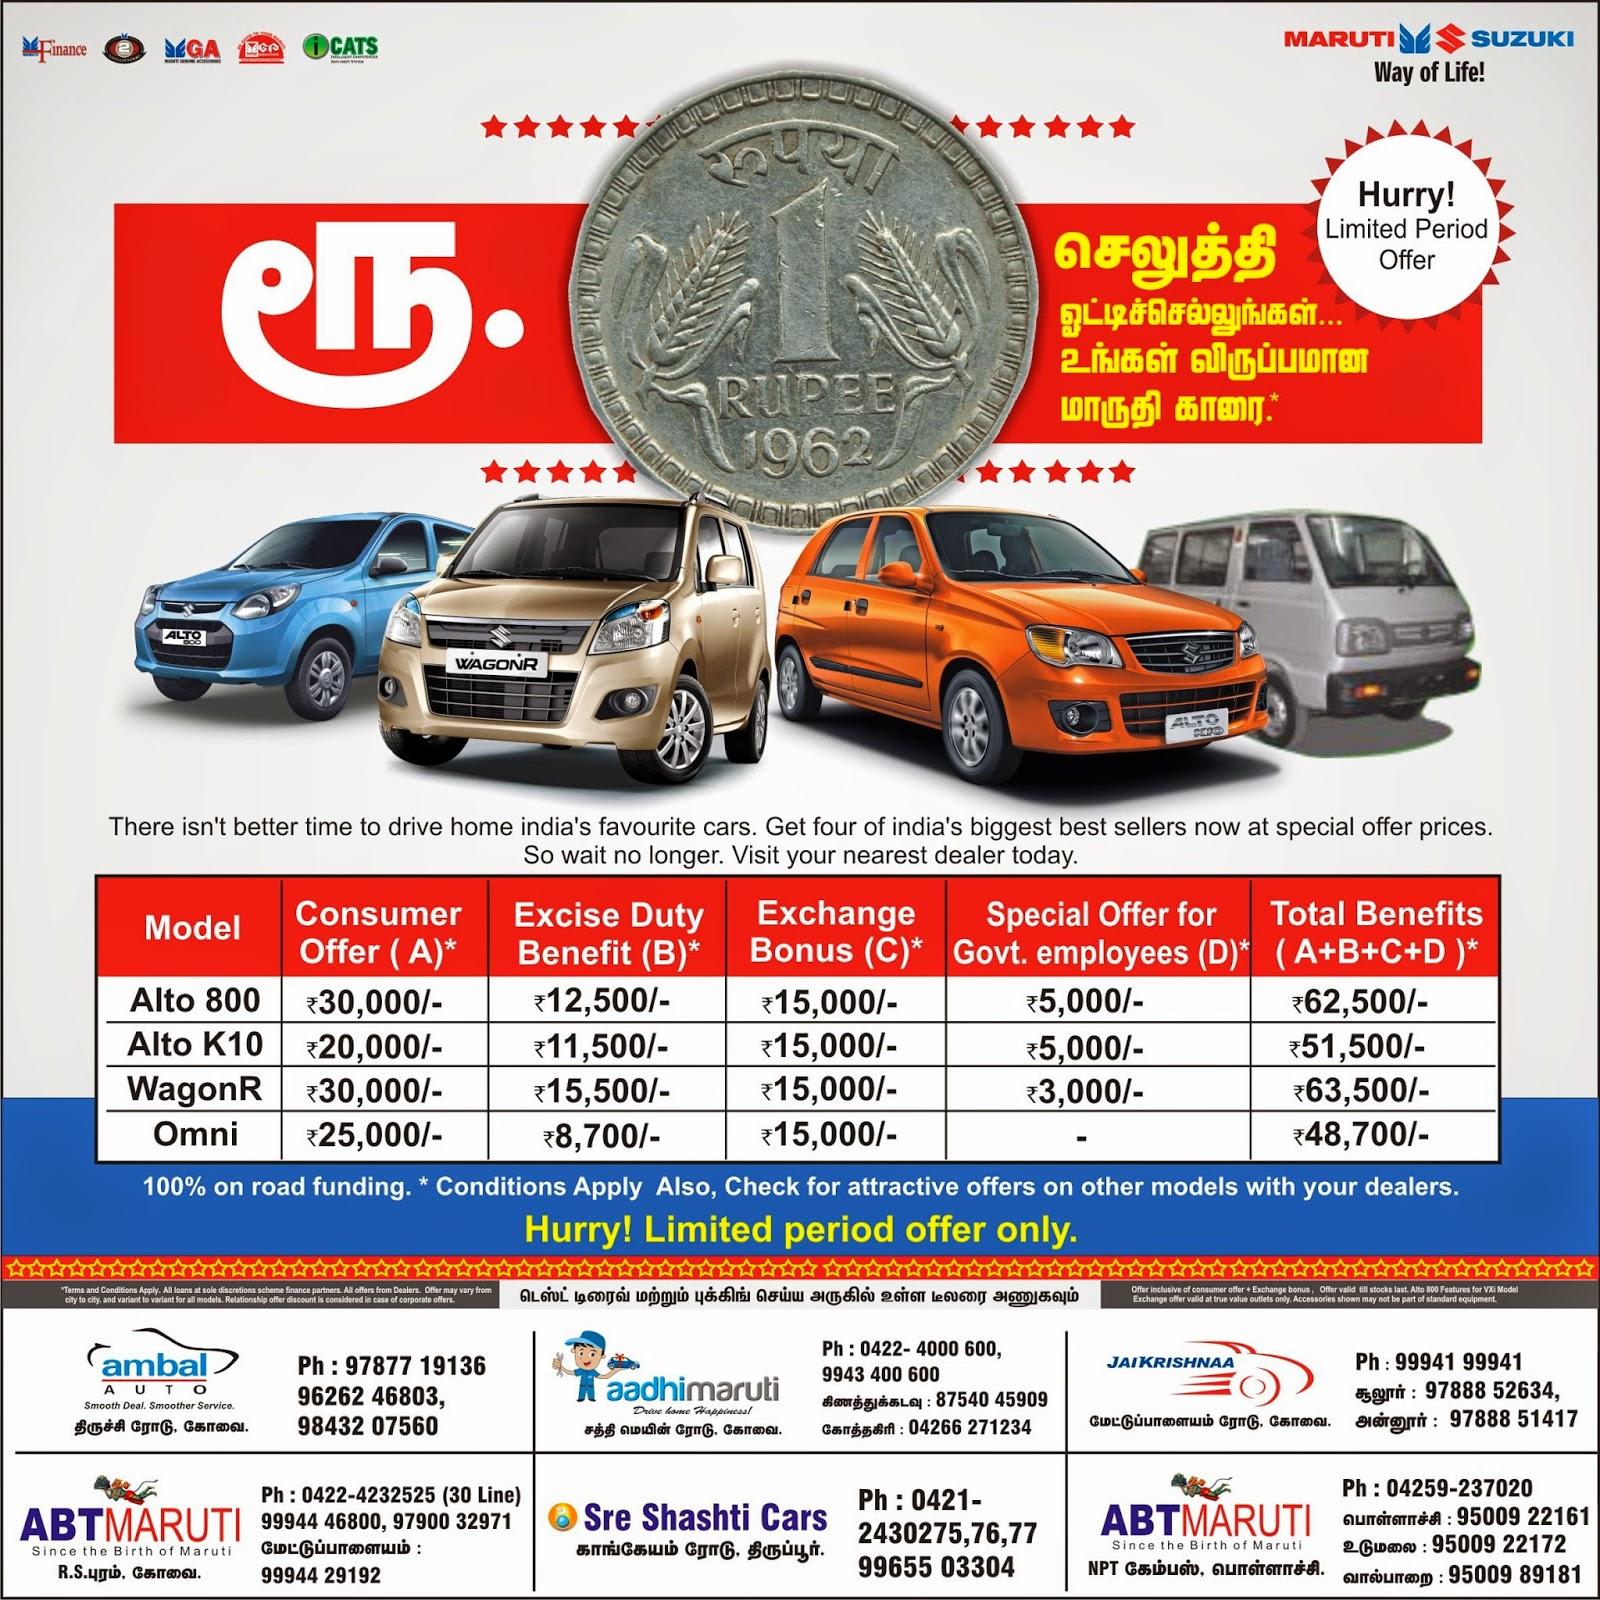 My Work: Maruti Suzuki Maruti Car Rs.1 Offer Ad